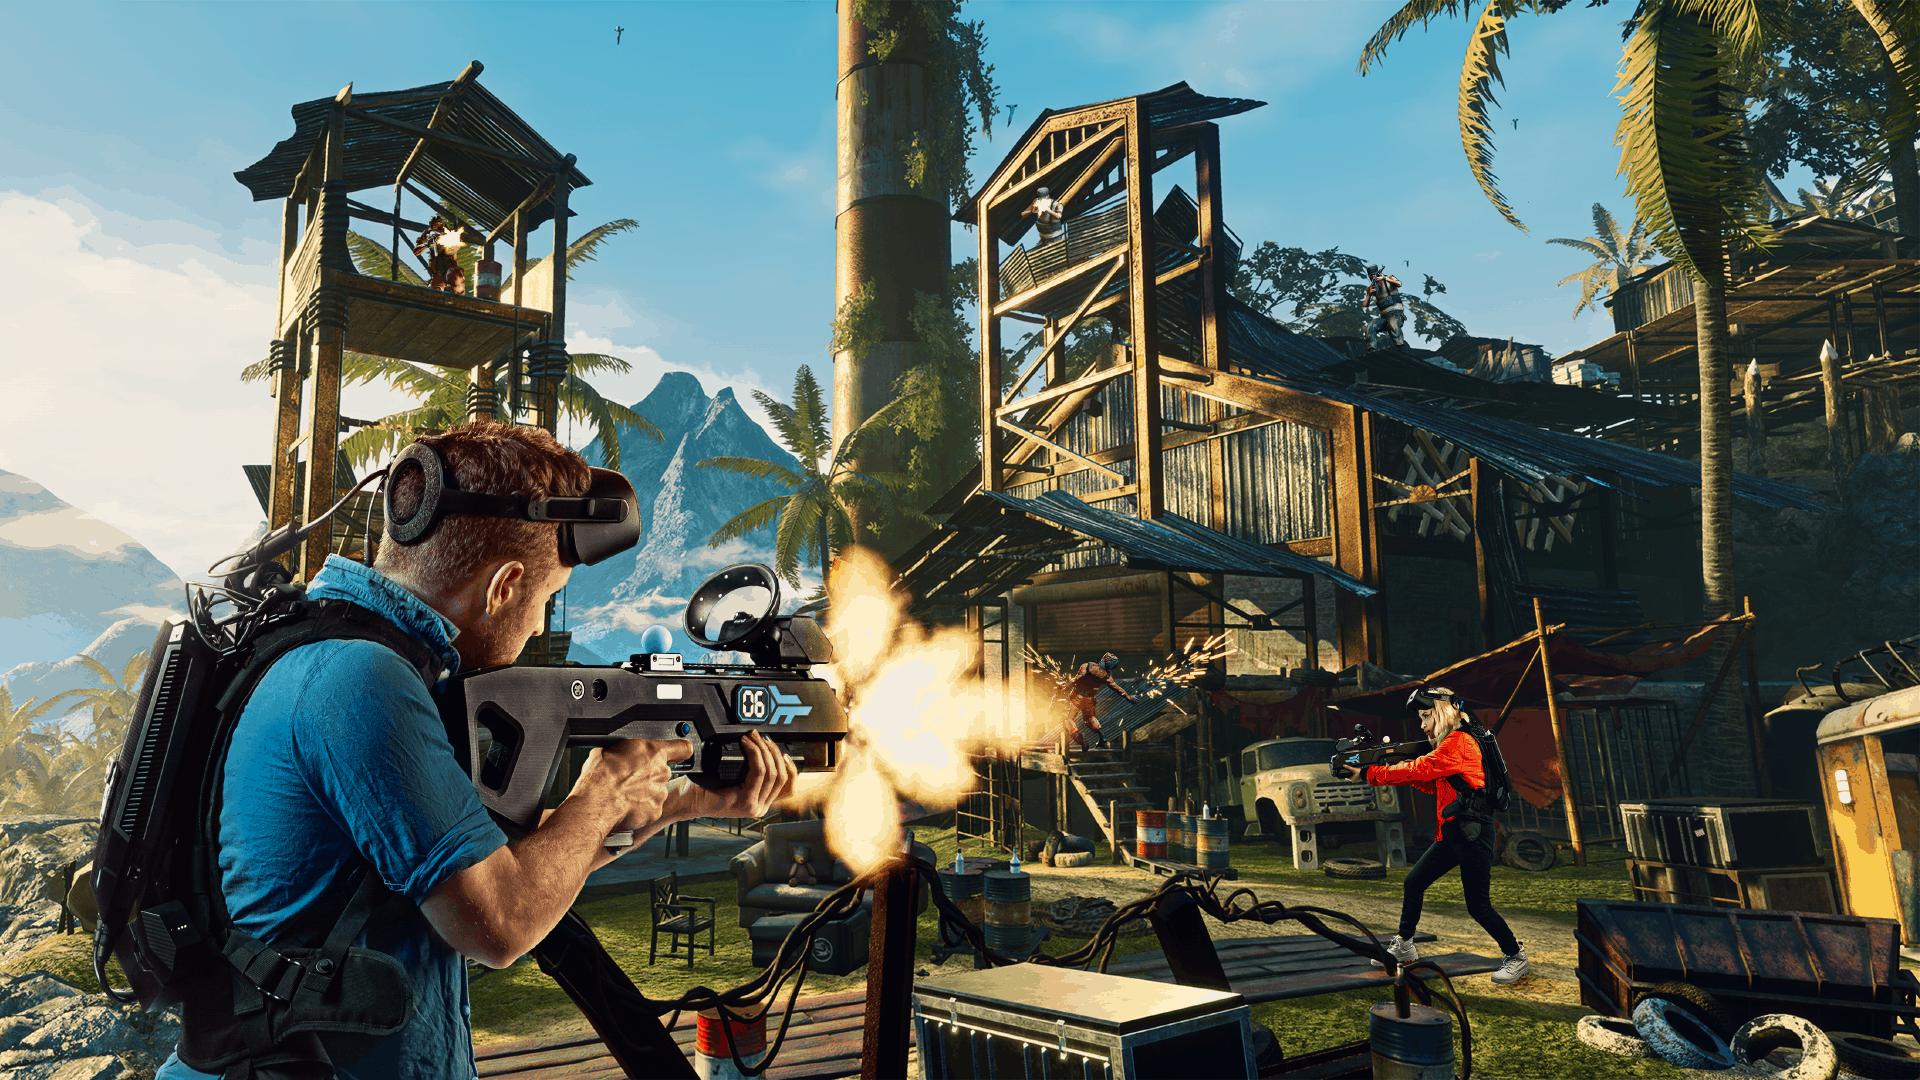 Far Cry free roam VR arena experience VR game screenshot